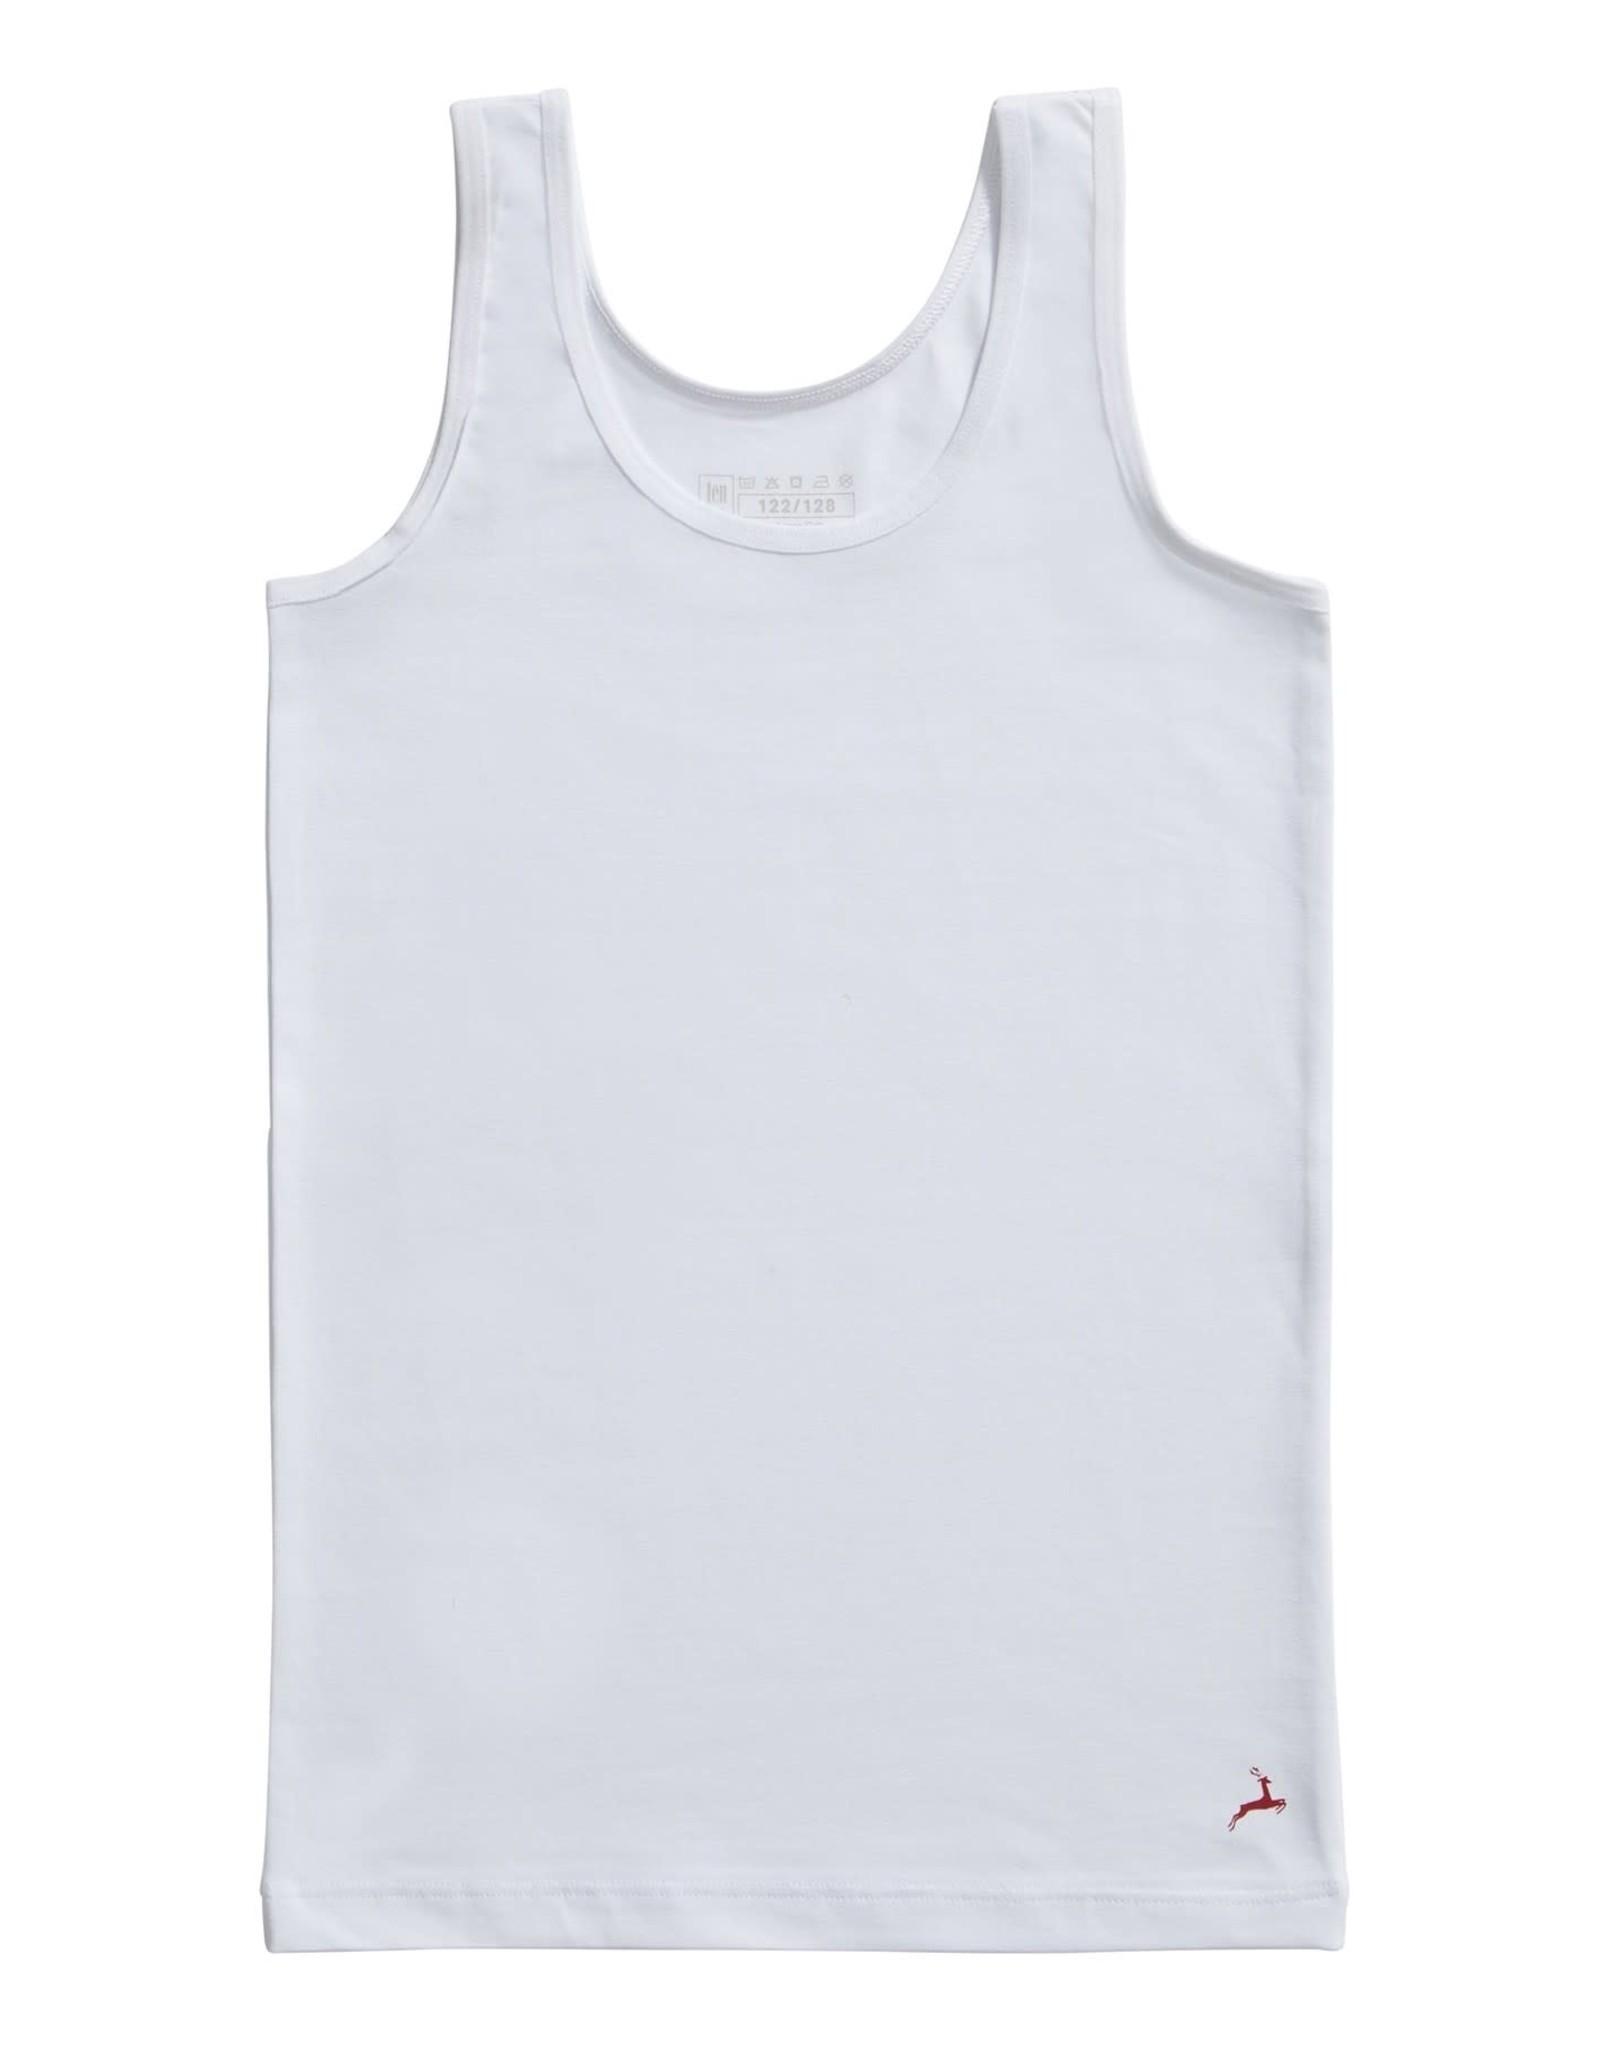 Ten Cate Basic girls shirt white